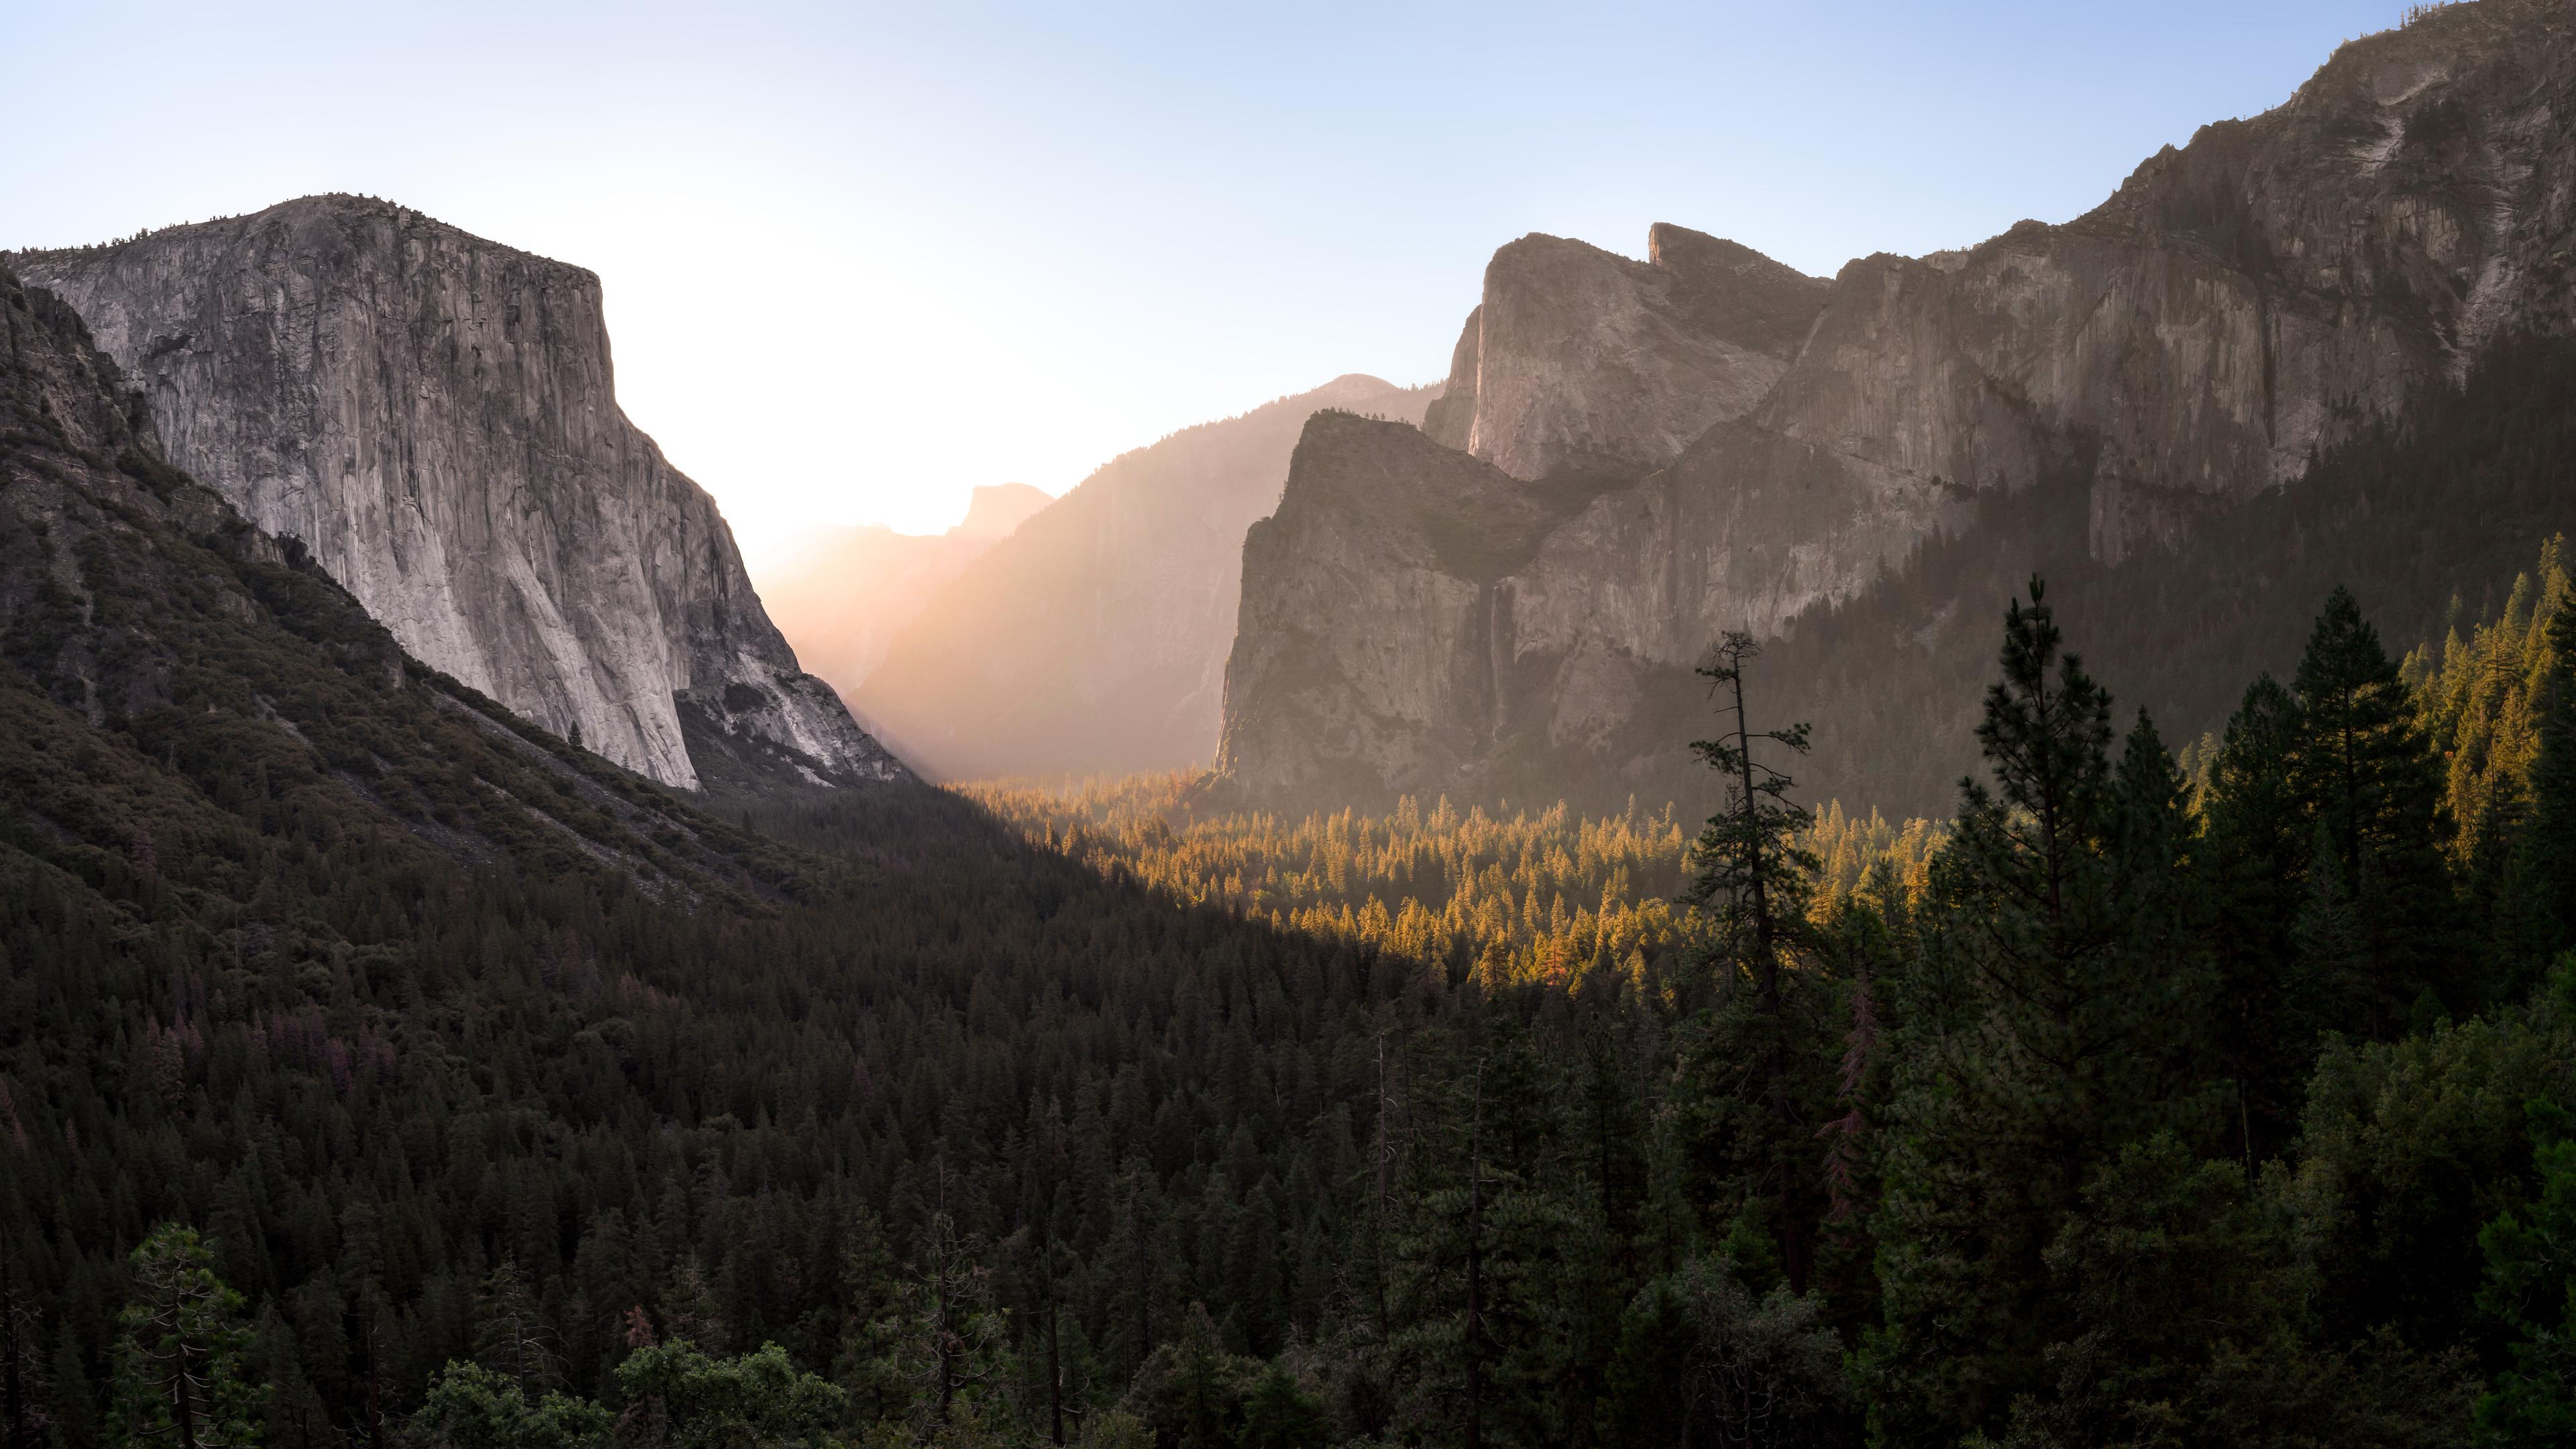 <b>2560x1080</b> 21:9 TV <b>Yosemite national</b> park <b>Wallpapers</b> HD, <b>Desktop</b> ...